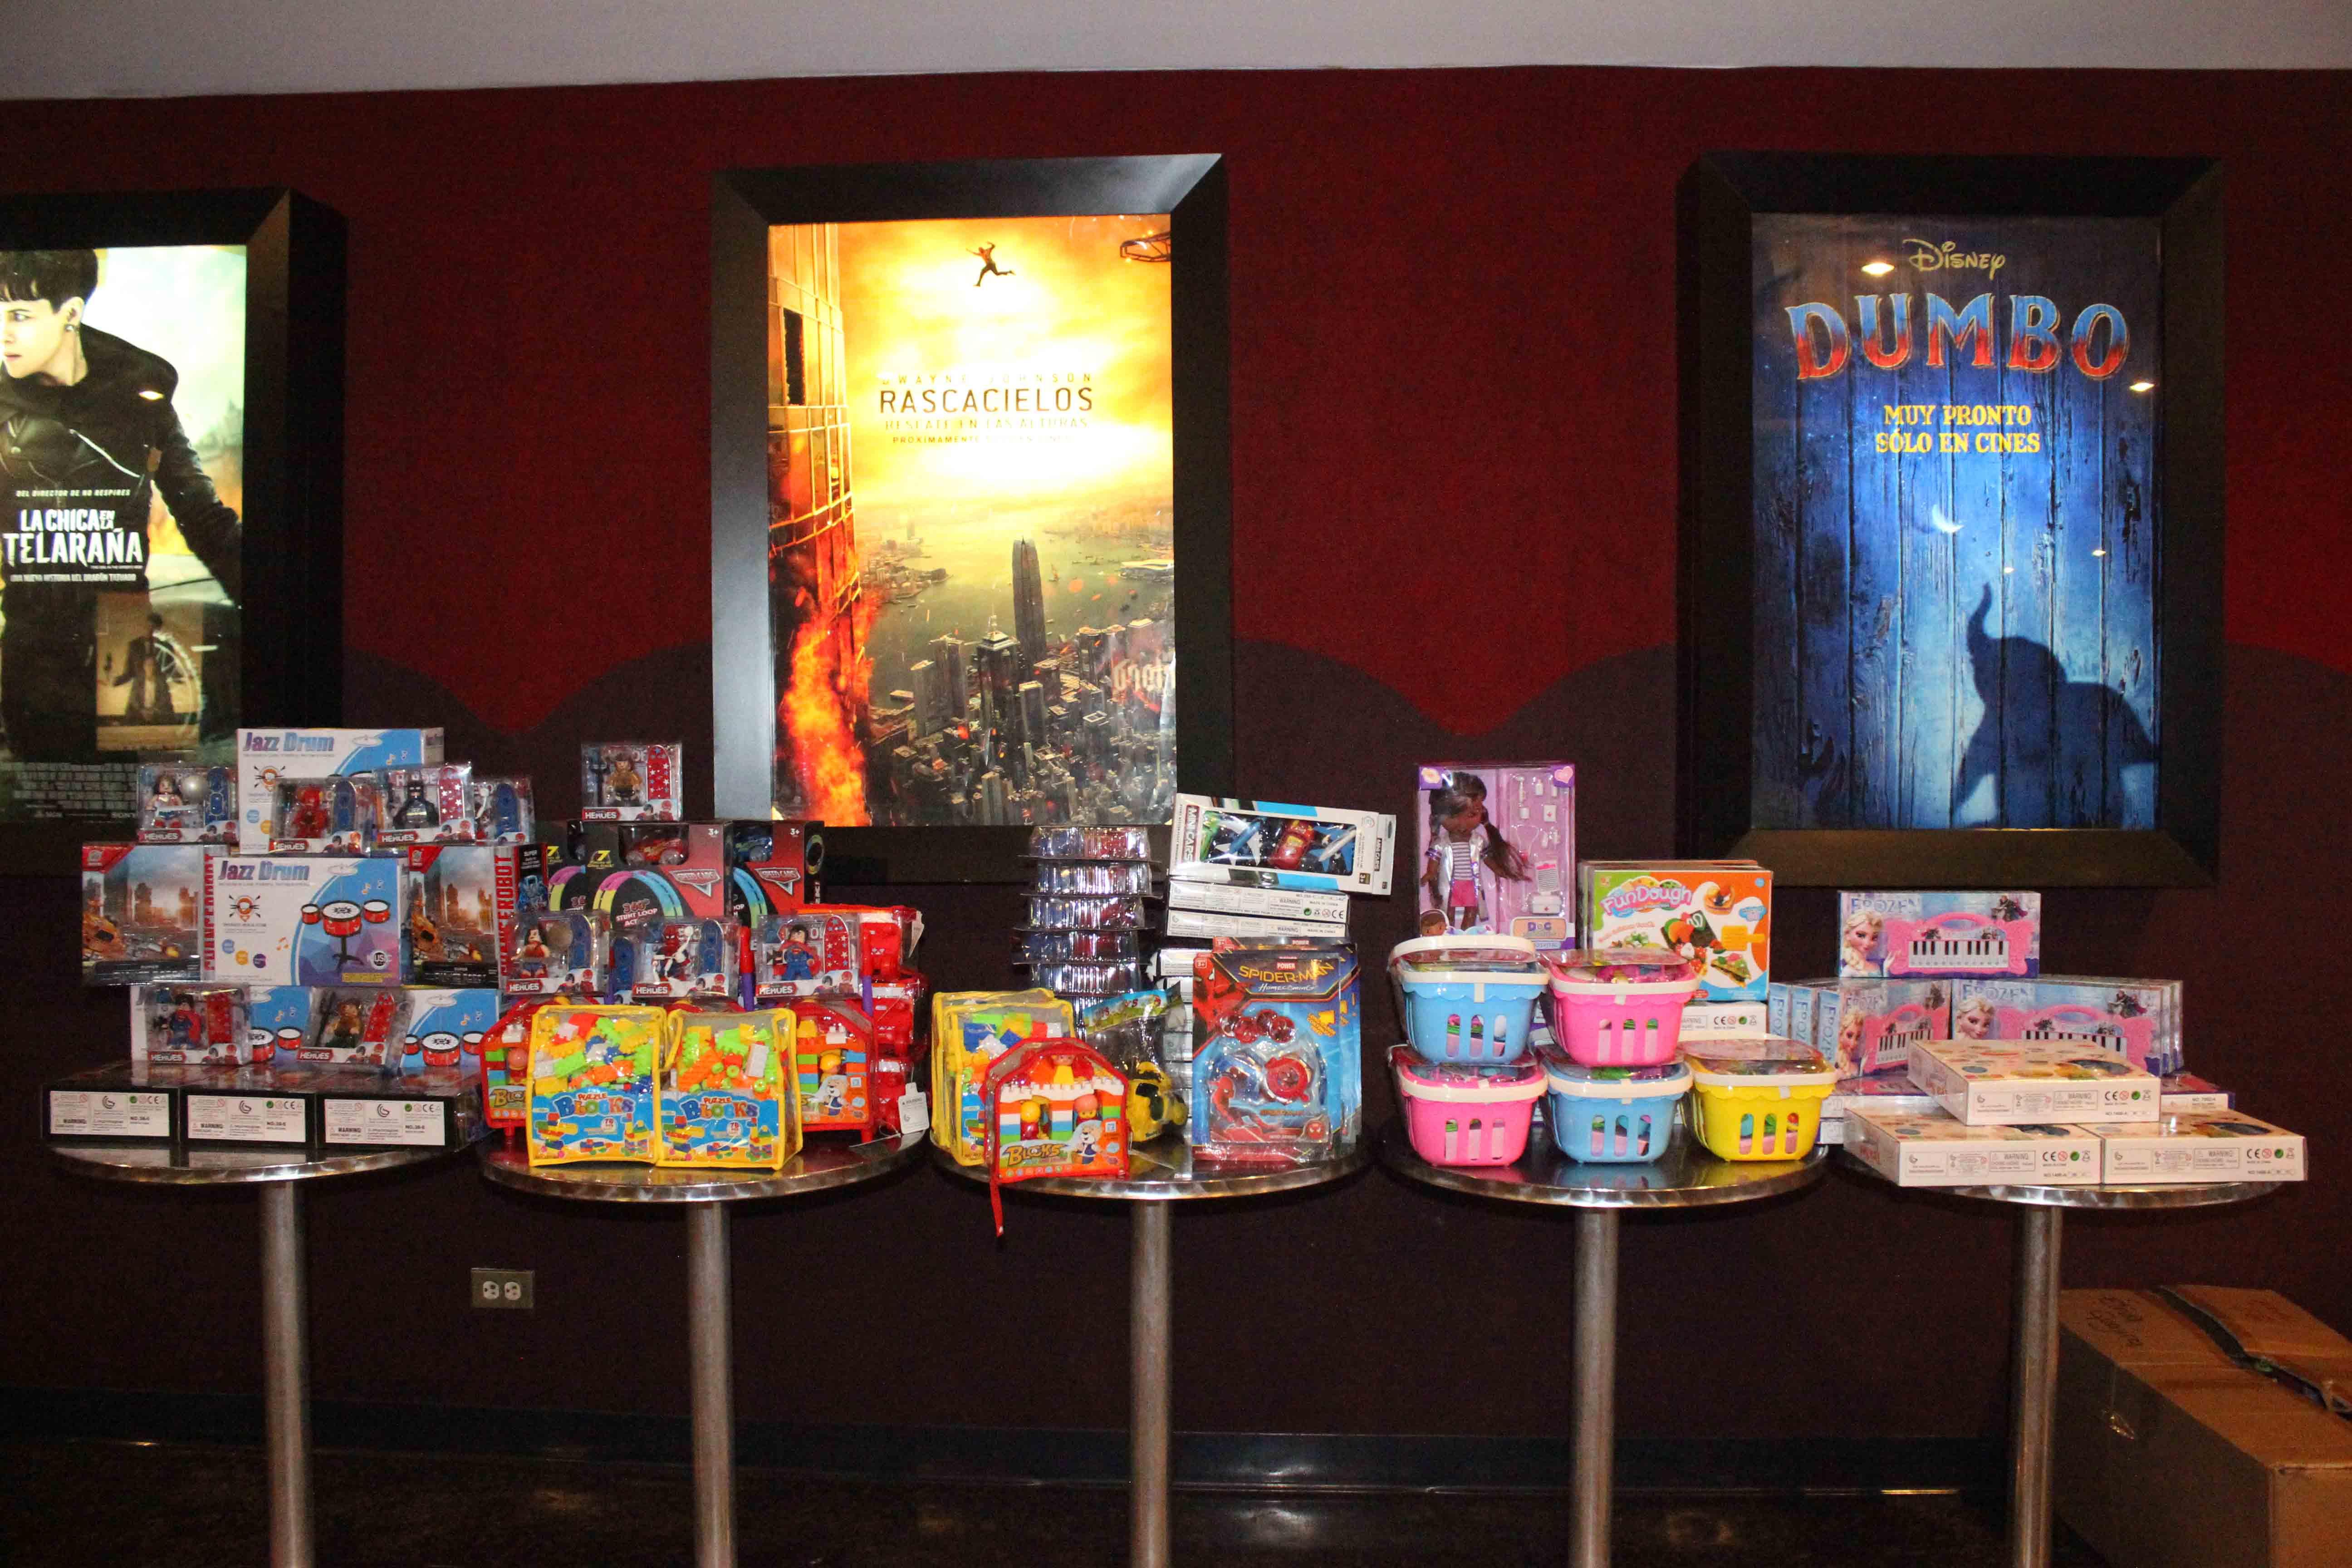 Gmcp garantiza Navidades Felices a través de cine-foro y entrega de juguetes (14)